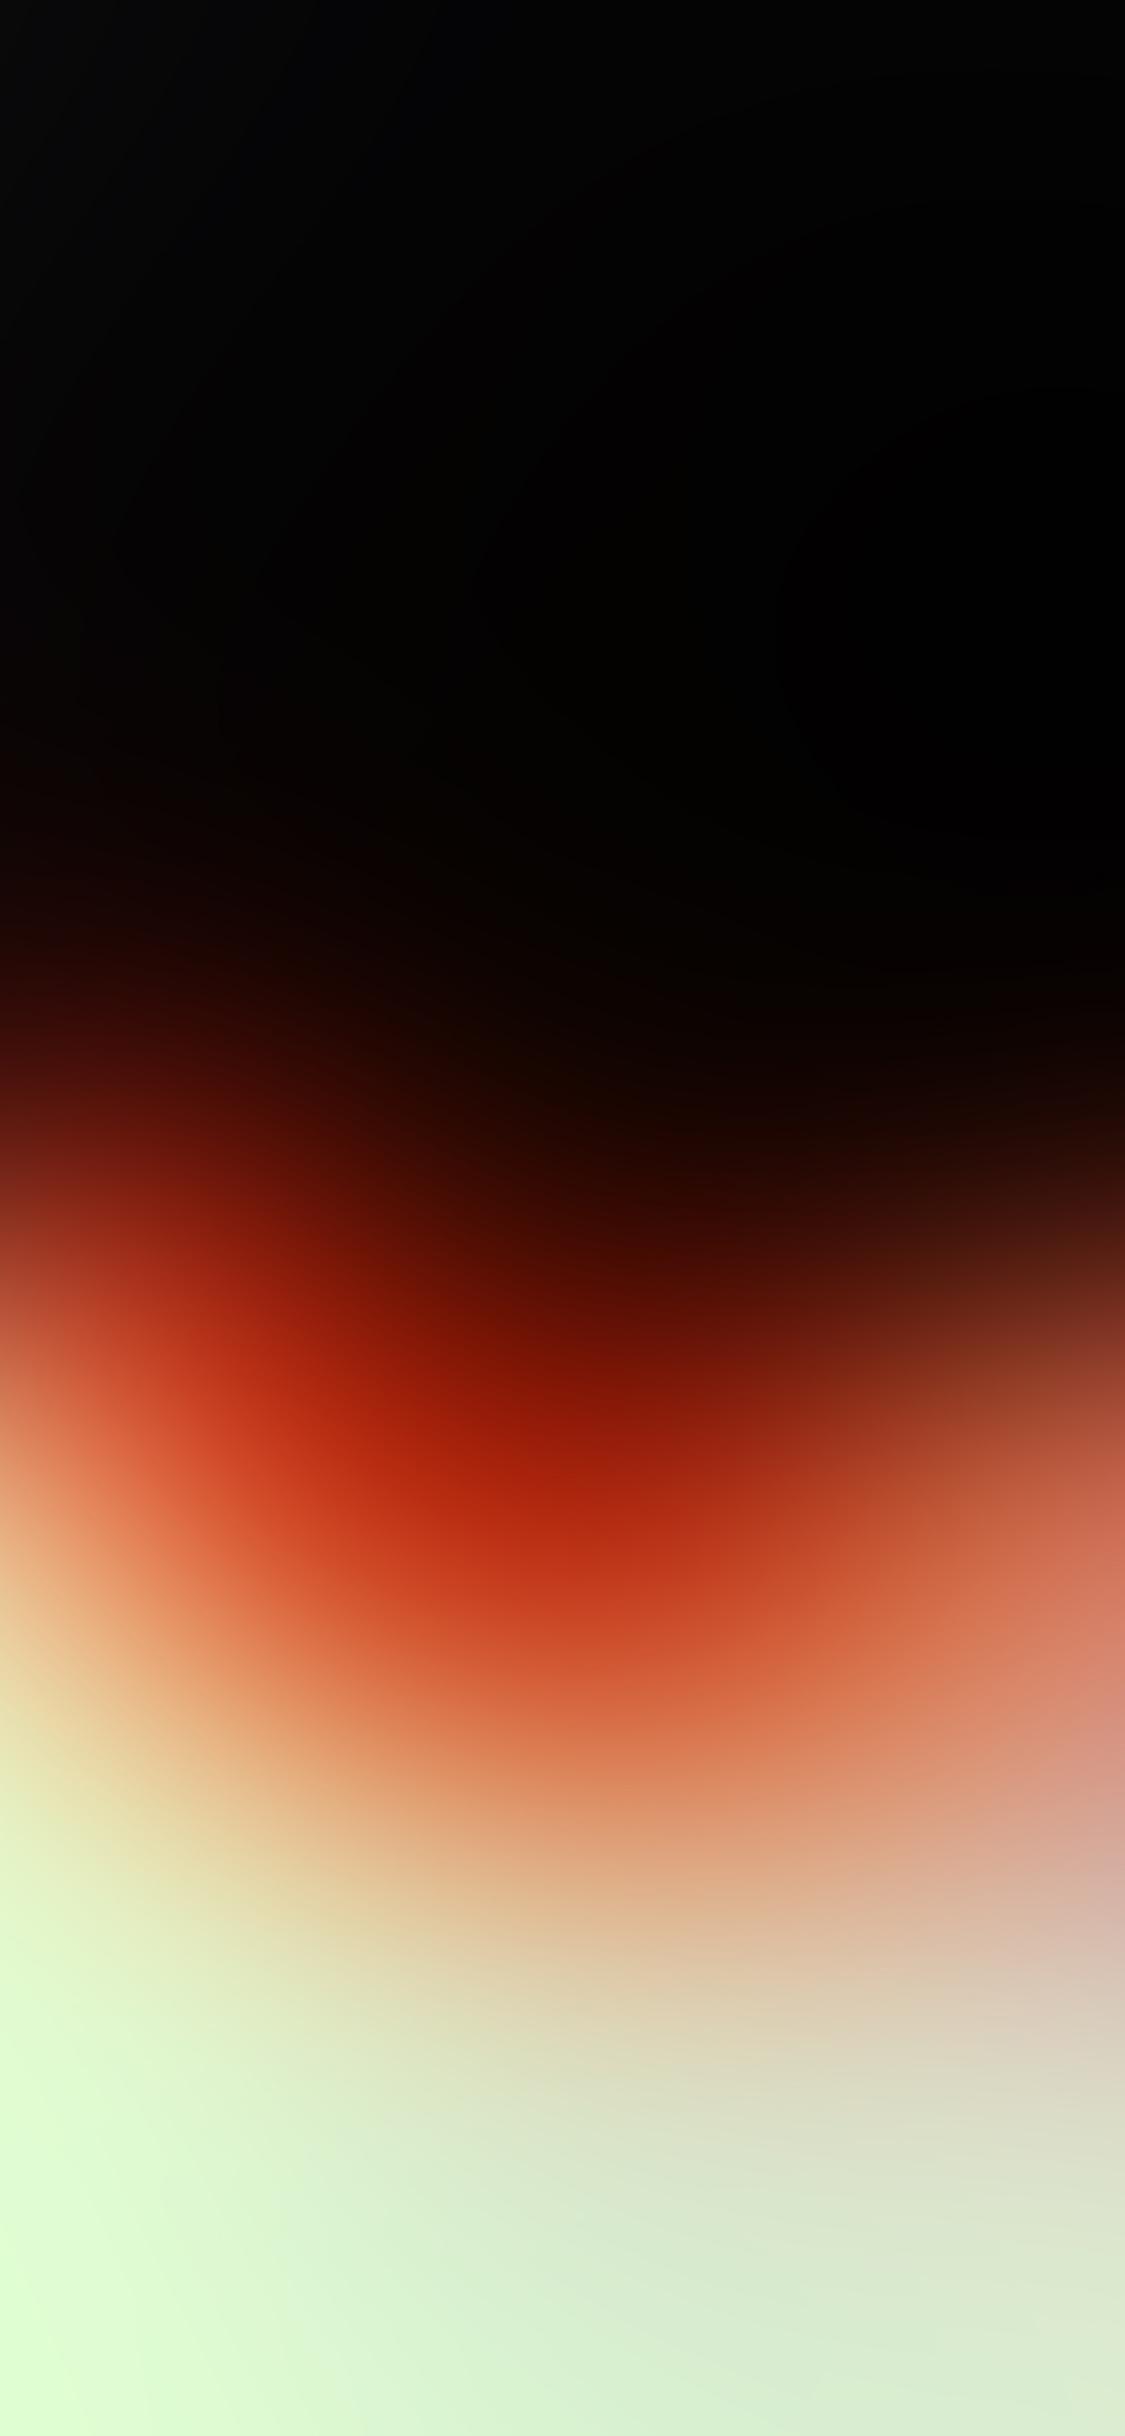 Papers Co Iphone Wallpaper Sj75 Dark Red Bokeh Gradation Blur